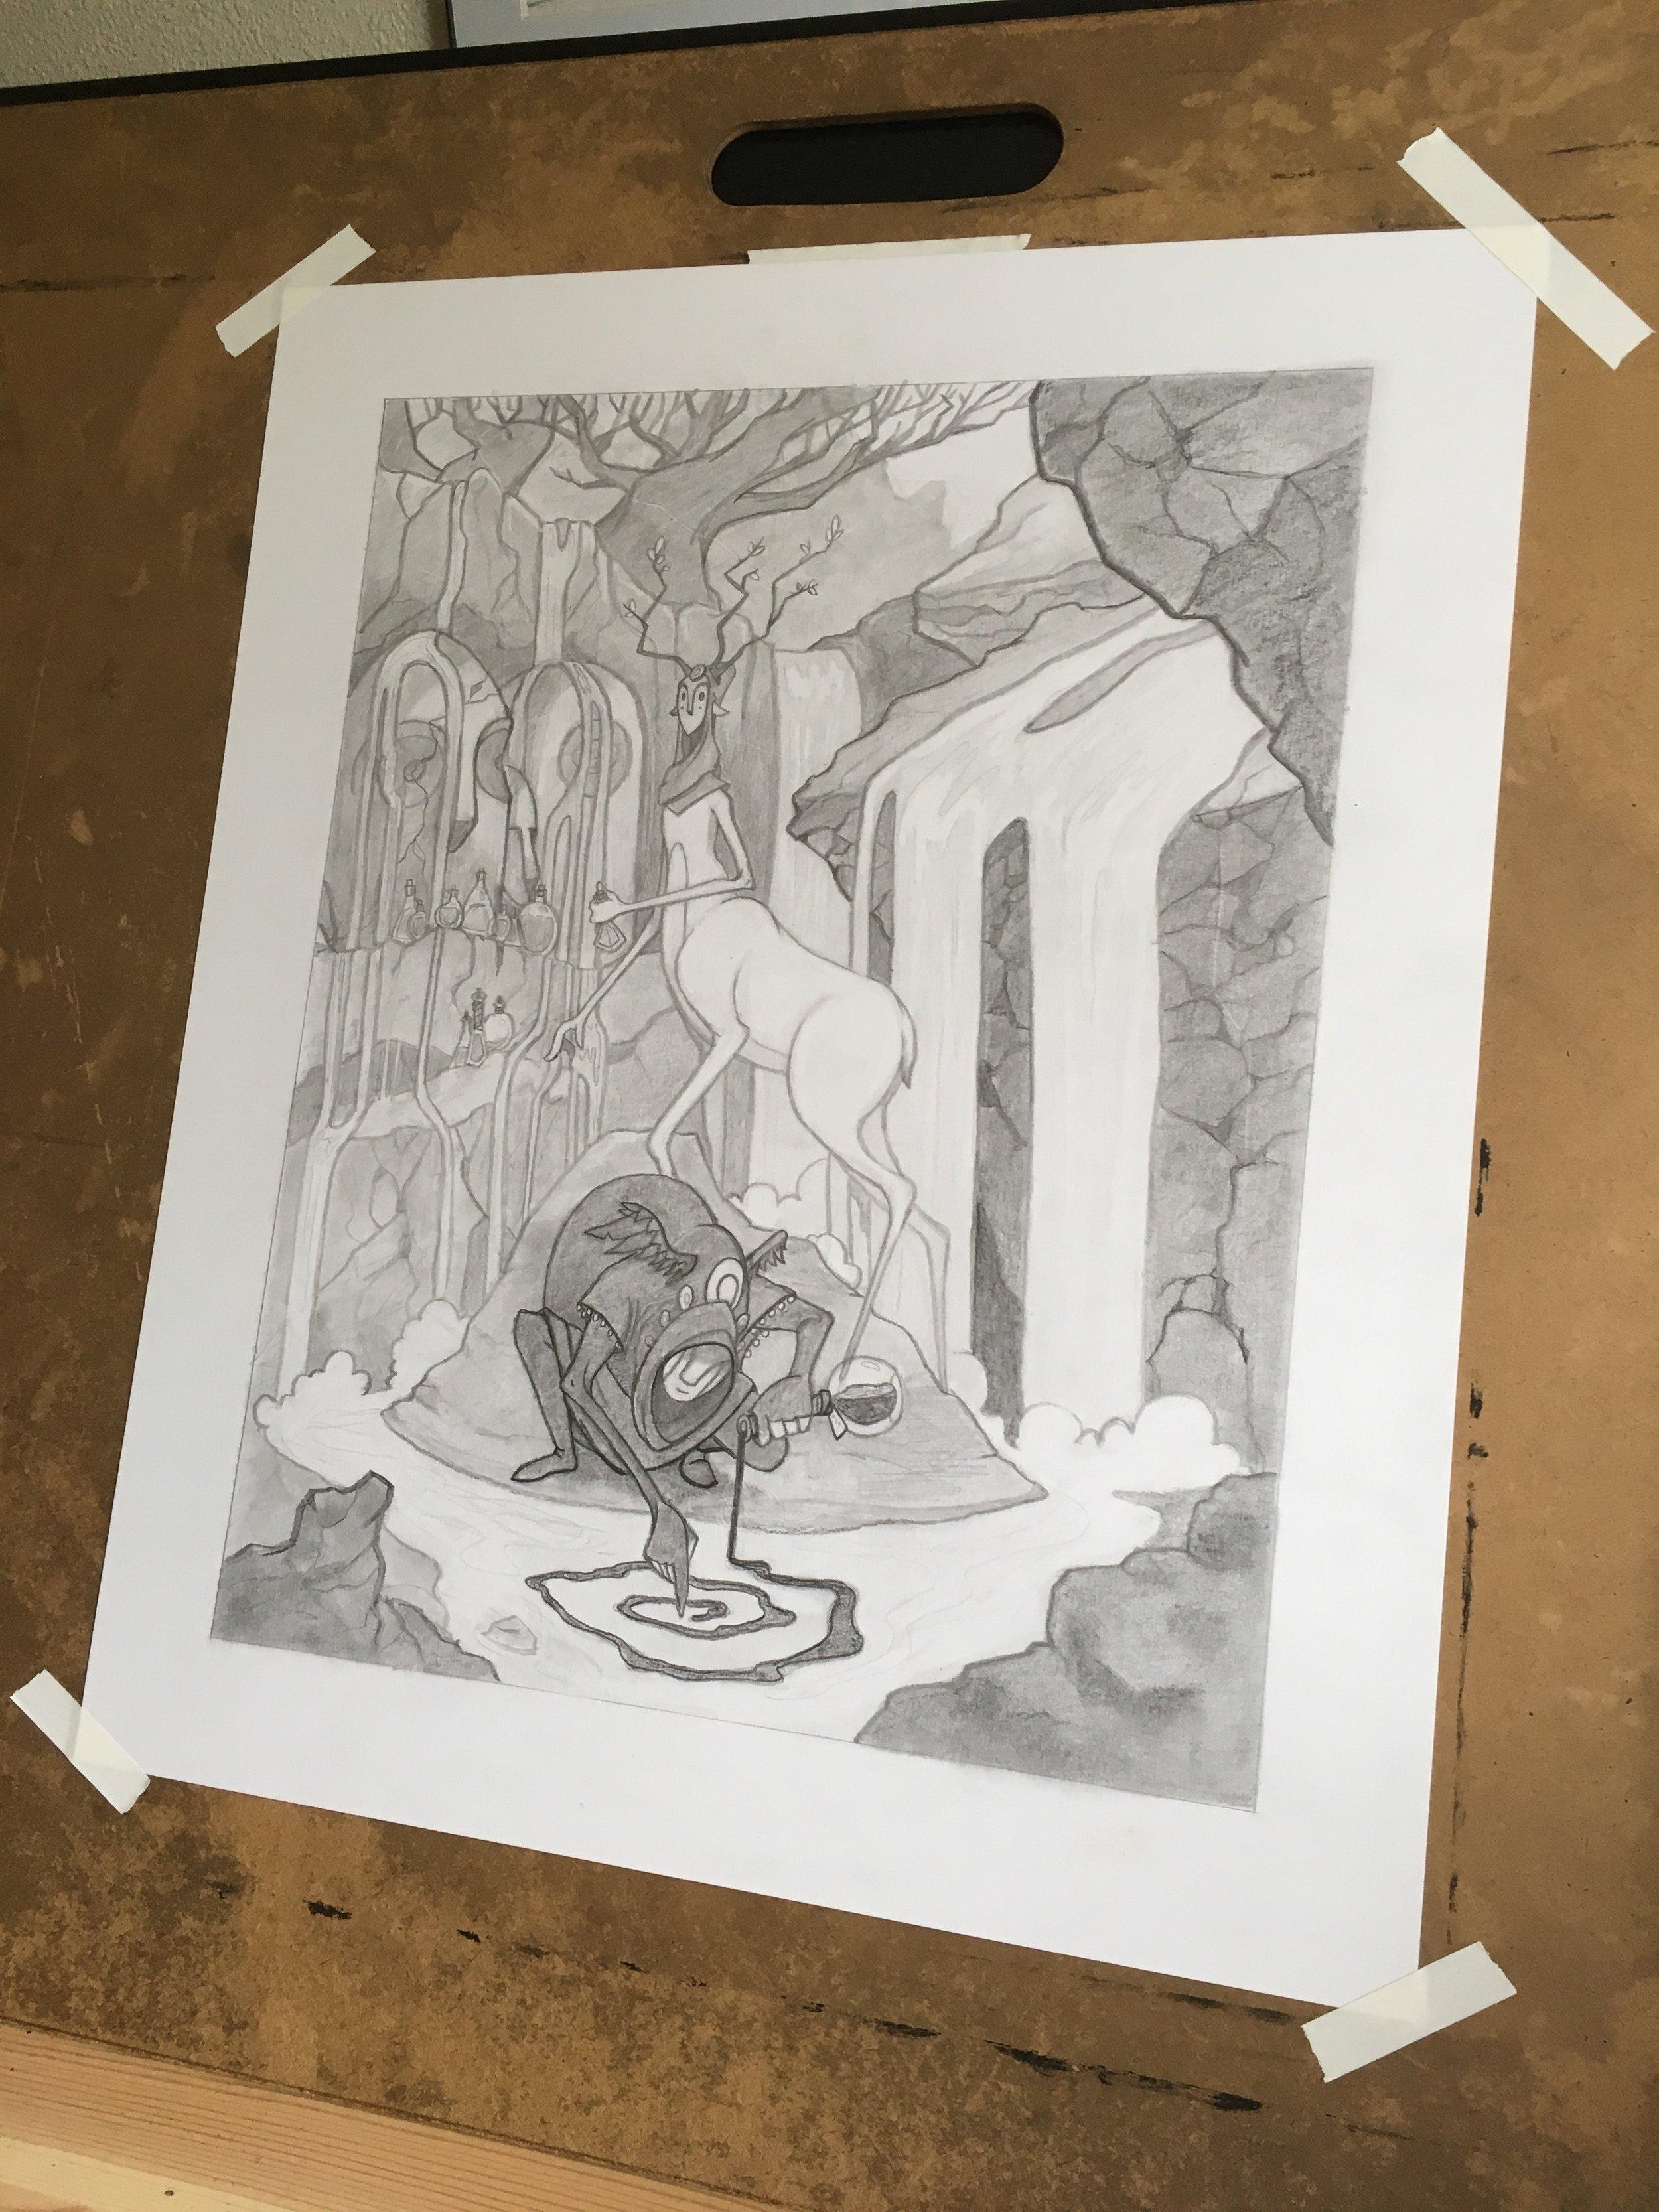 Gloamlings drawing